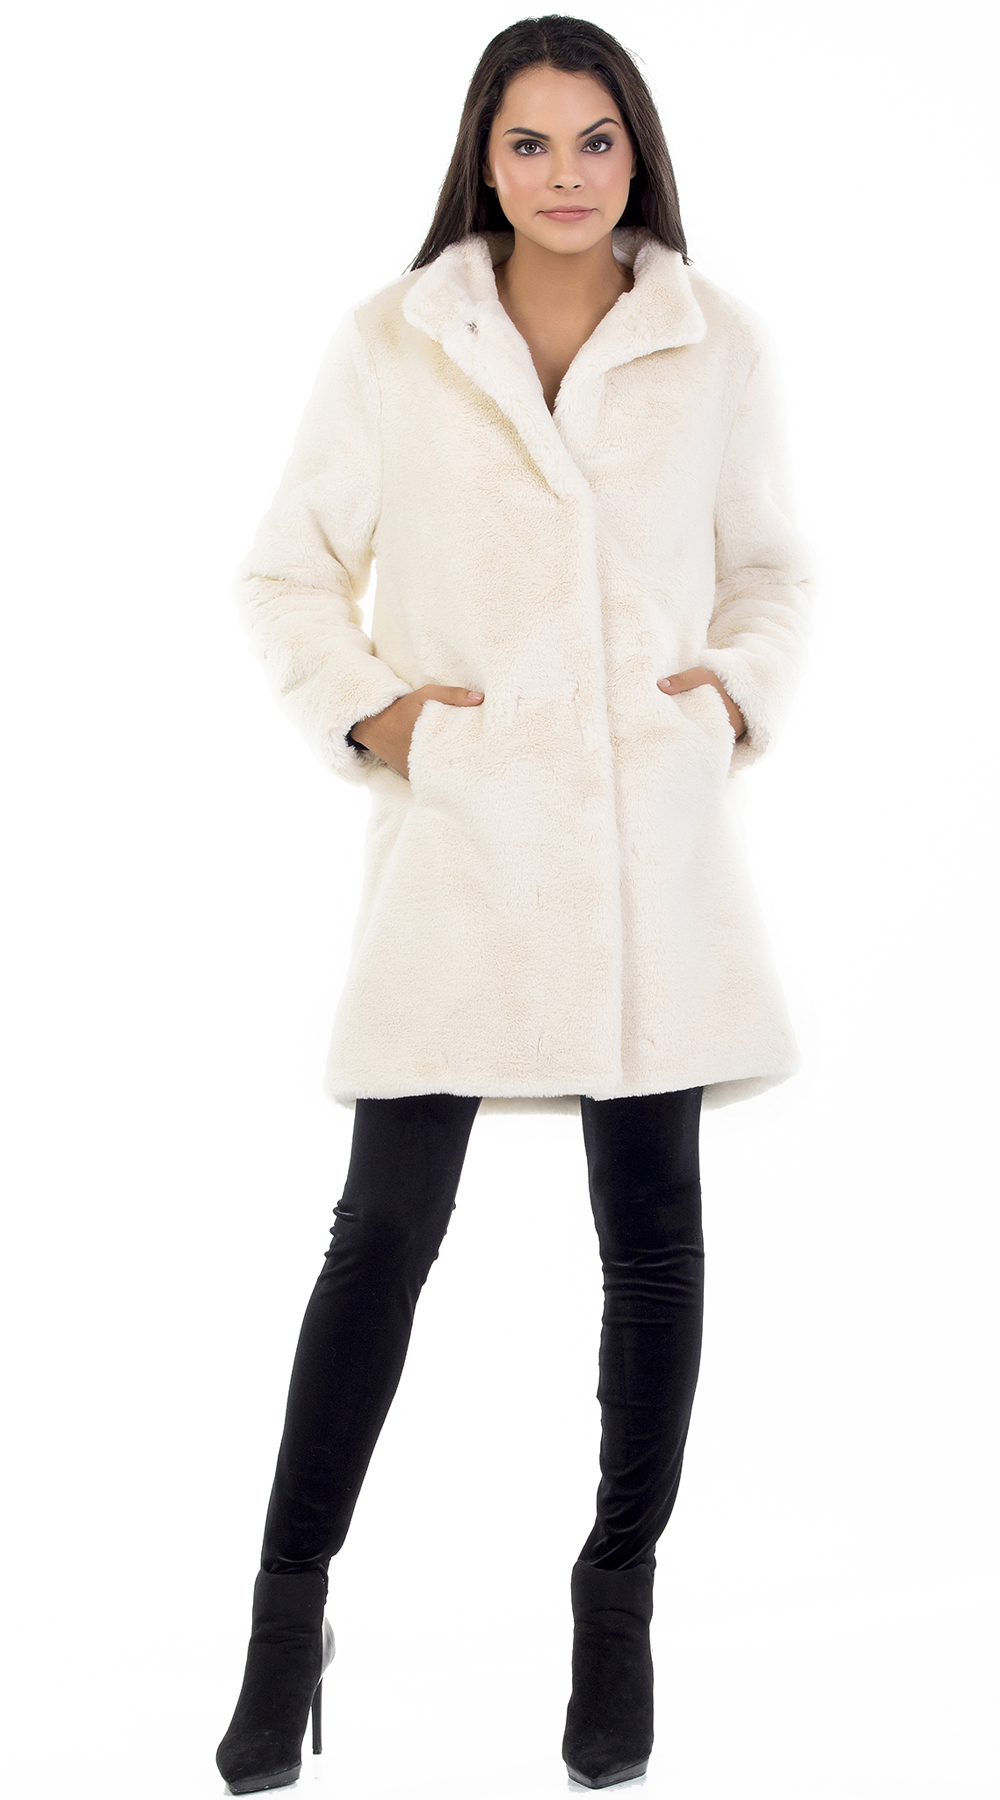 e3385182399 Γυναικείο γούνινο πανωφόρι Online - ONLINE - W18ON-47006